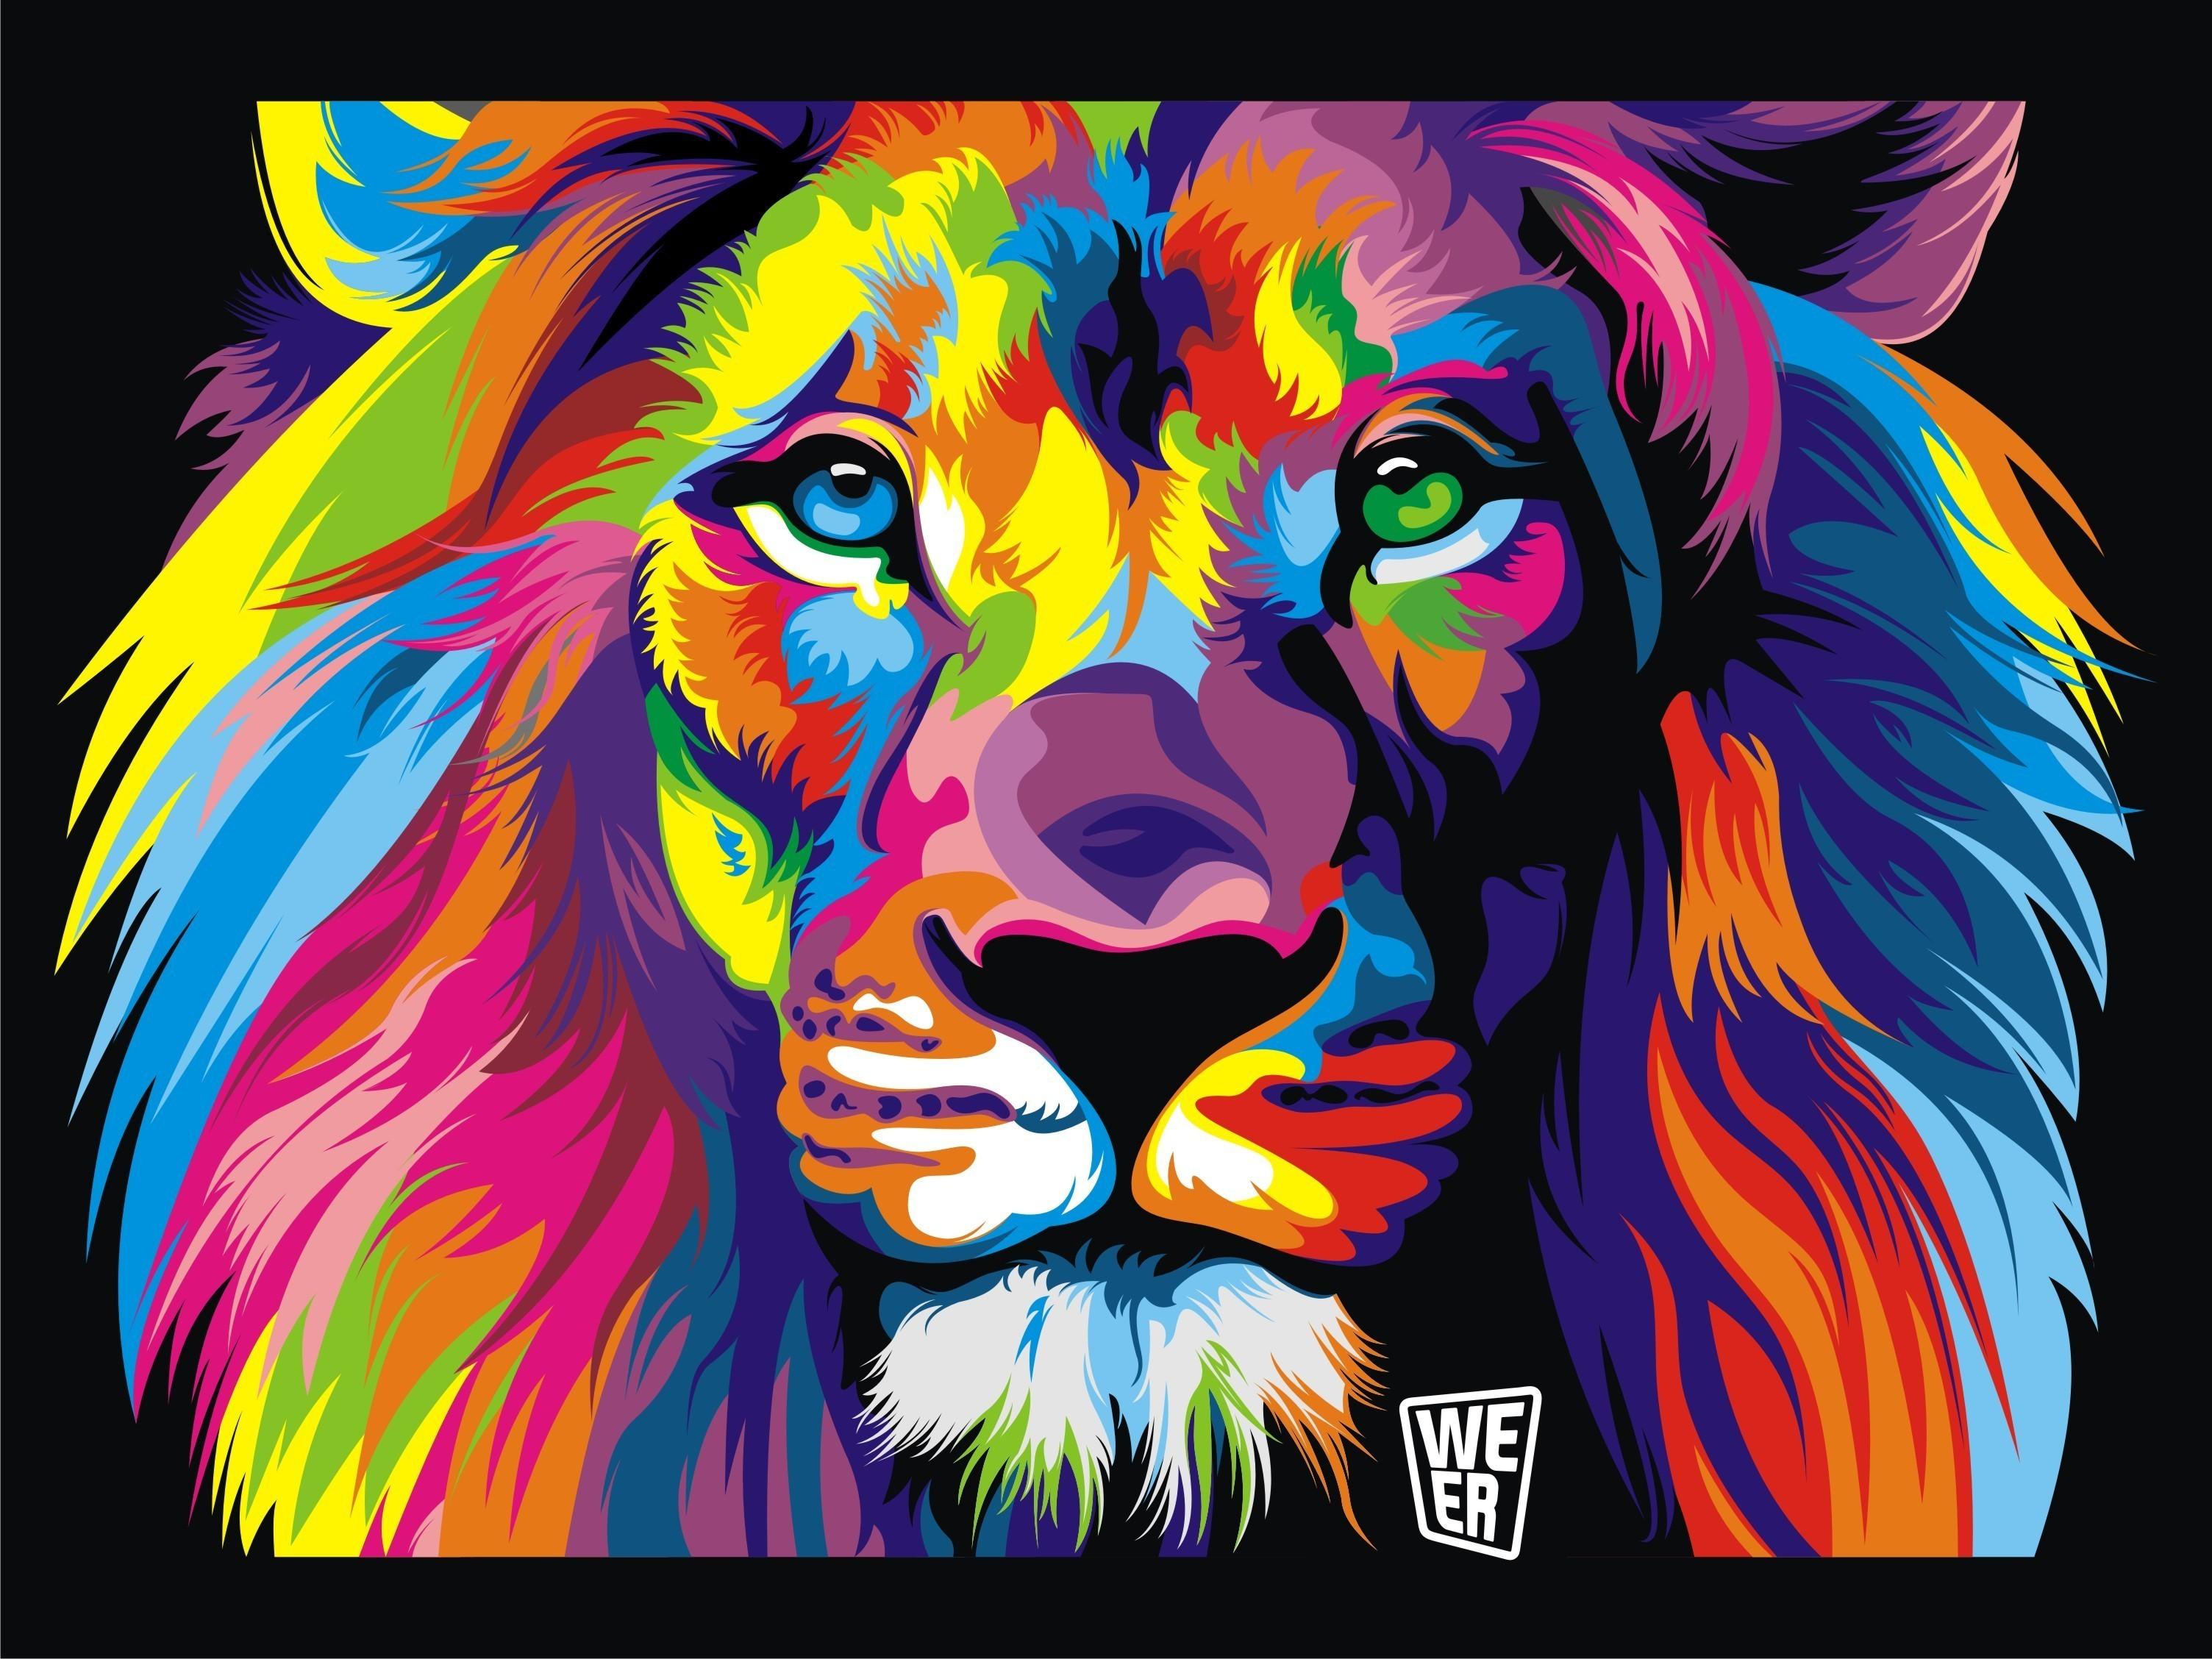 Wallpaper Colorful Illustration Digital Art Animals